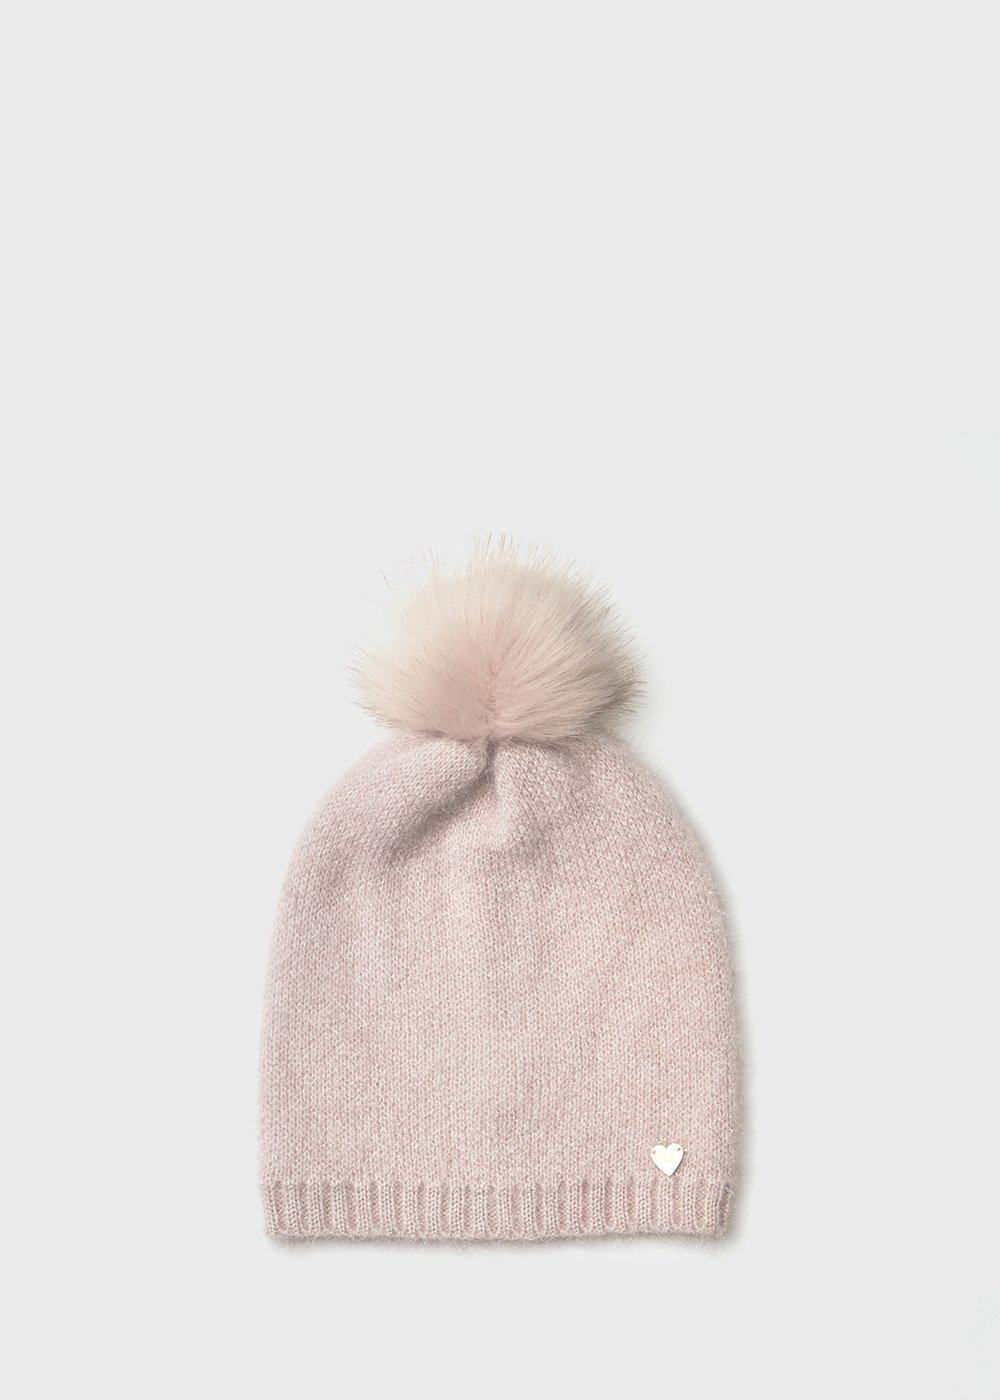 Fur - effect Cam hat - Sepia - Woman